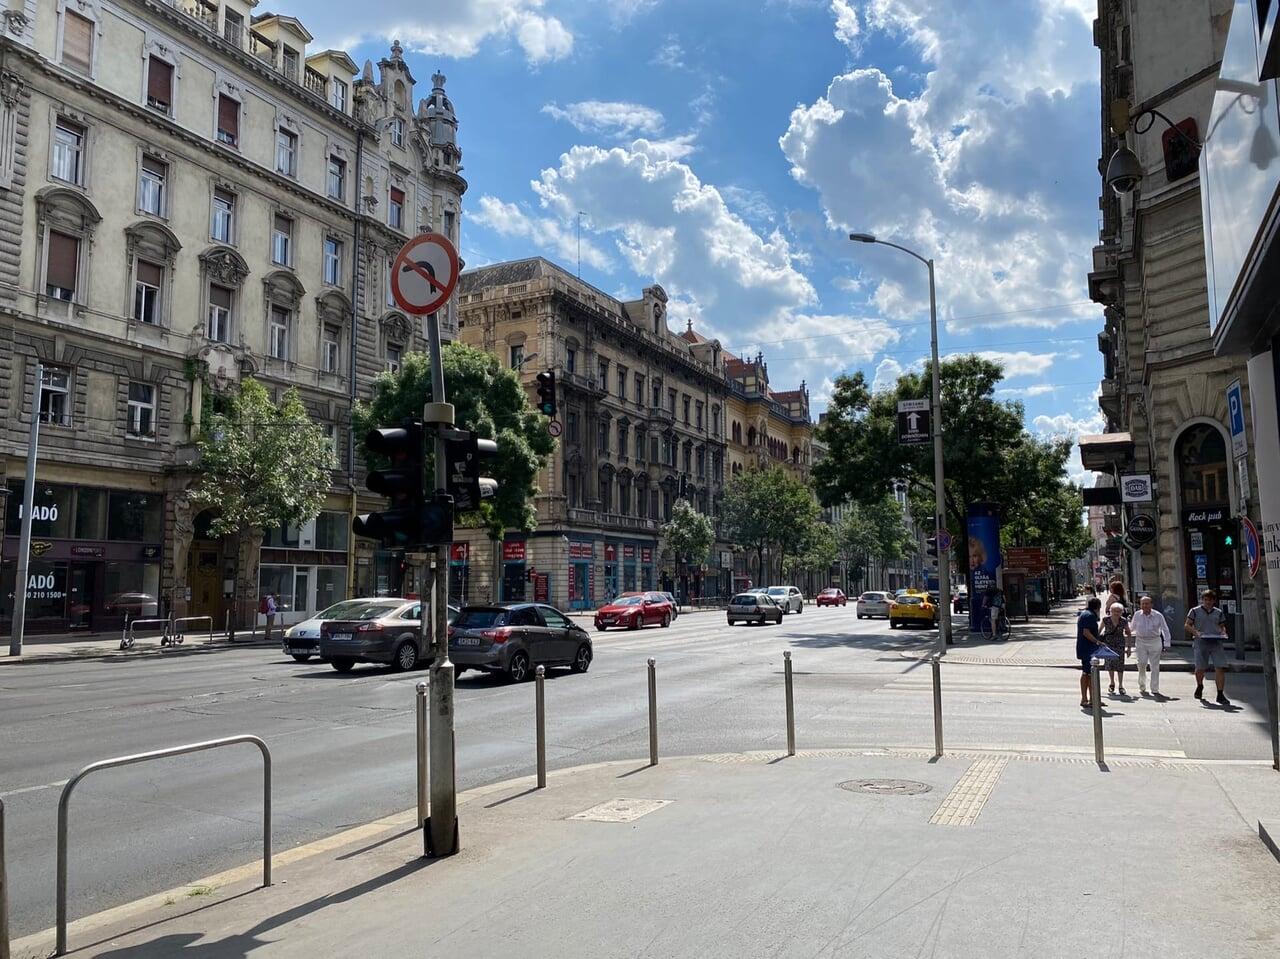 Будапешт – столица футбола. Здесь я почувствовал драйв Евро